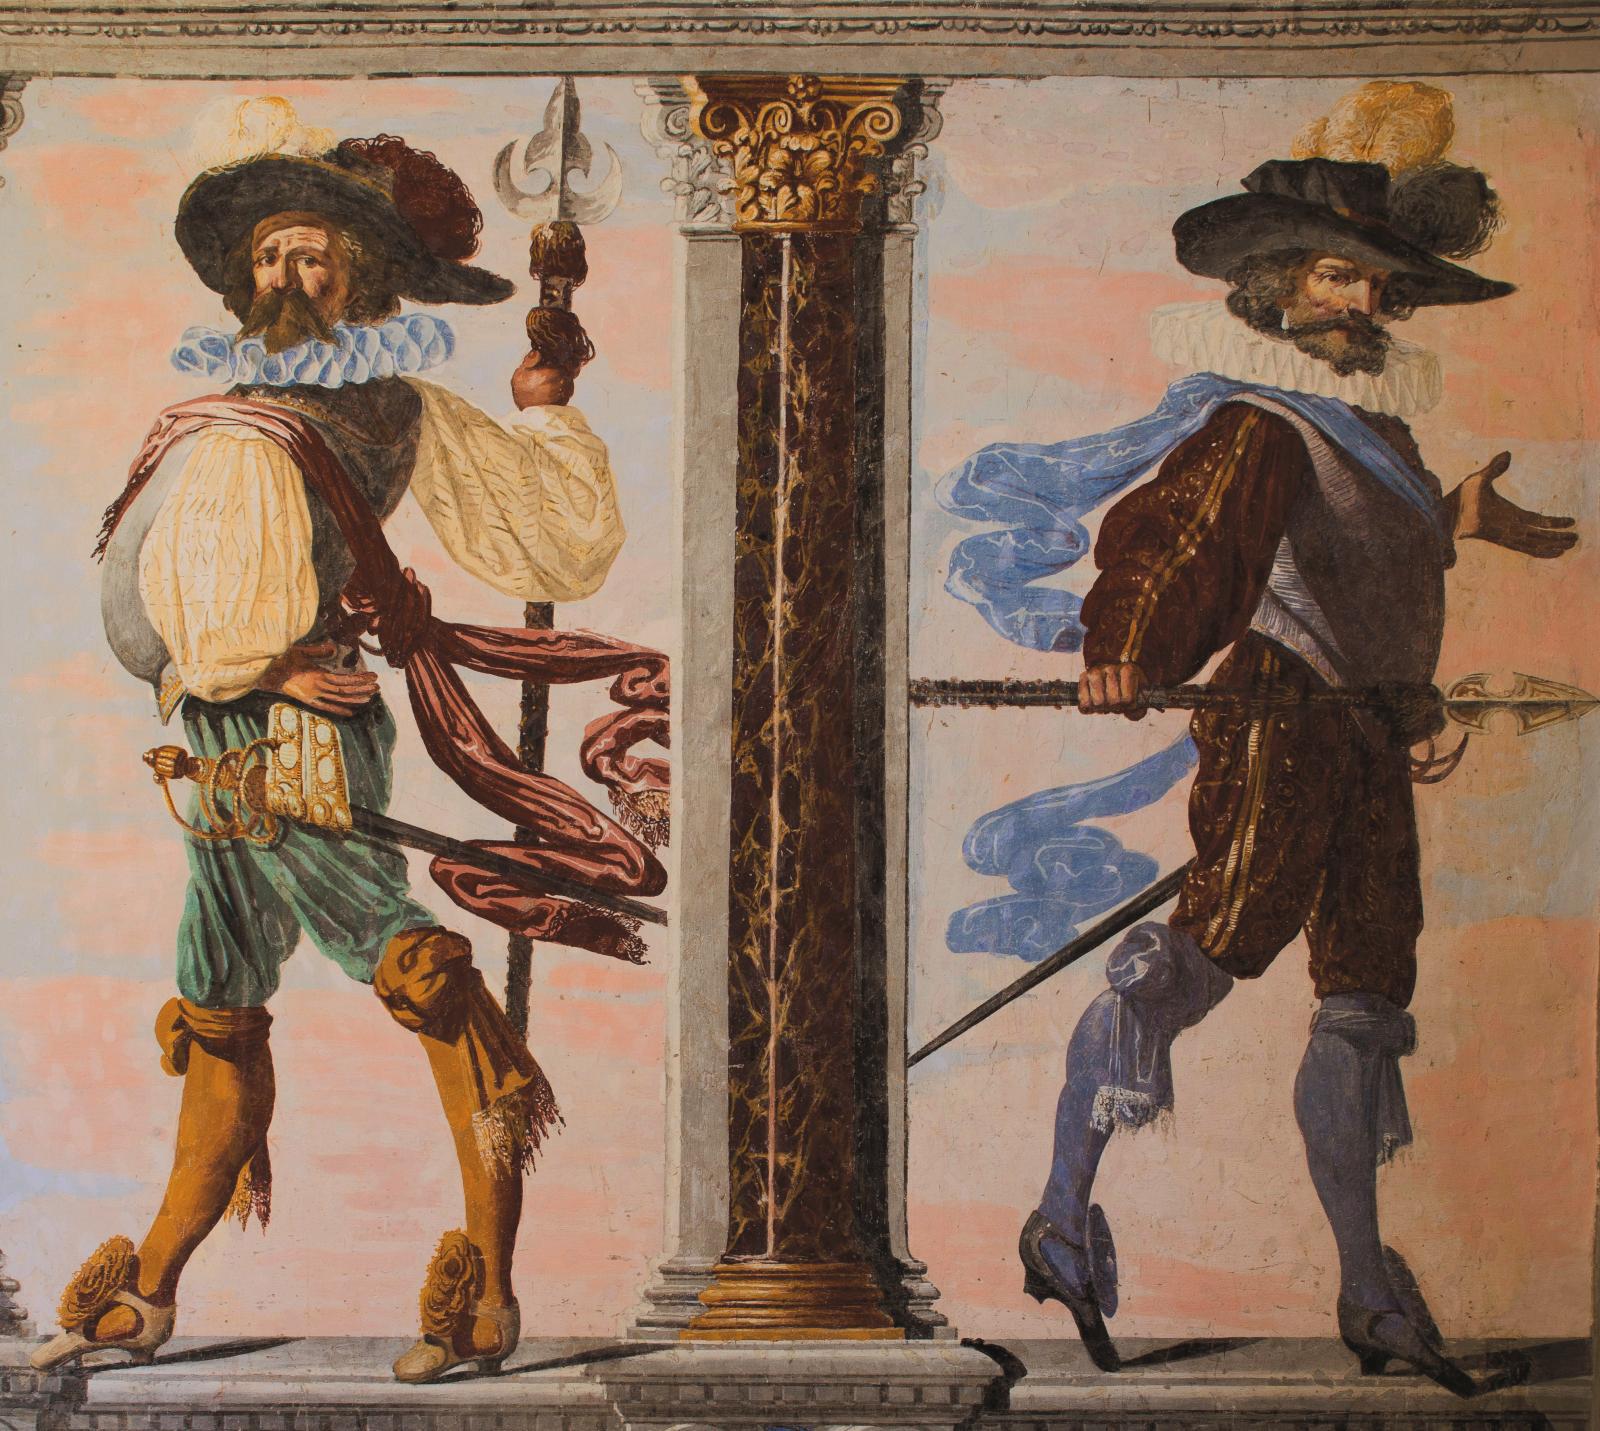 Pietro Ricchi, Chambre de la Parade, 1632 (detail).